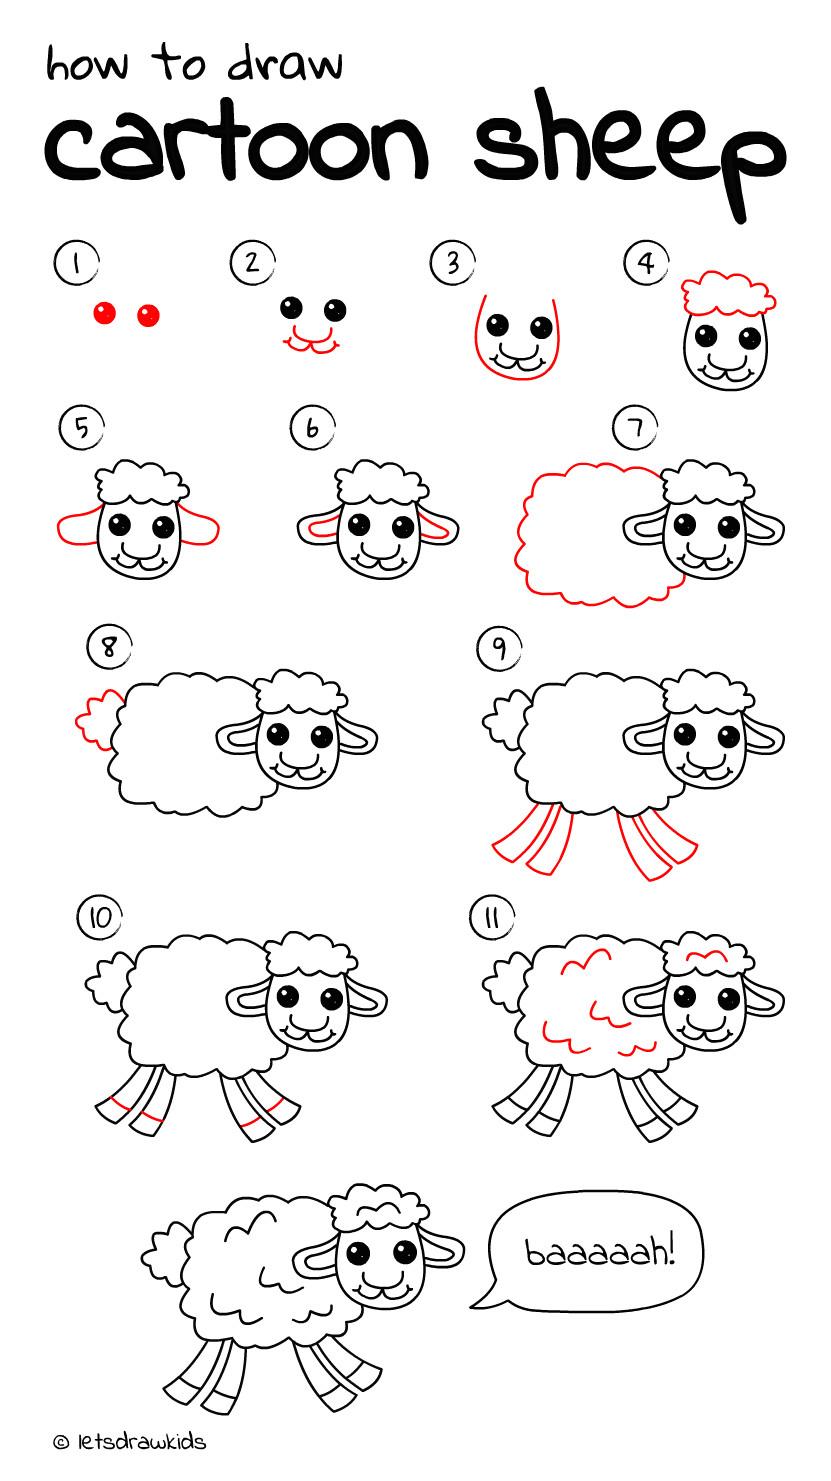 Drawing A Cartoon Sheep Pin by Nafas On Drawings Drawings Cartoon Drawings Easy Drawings